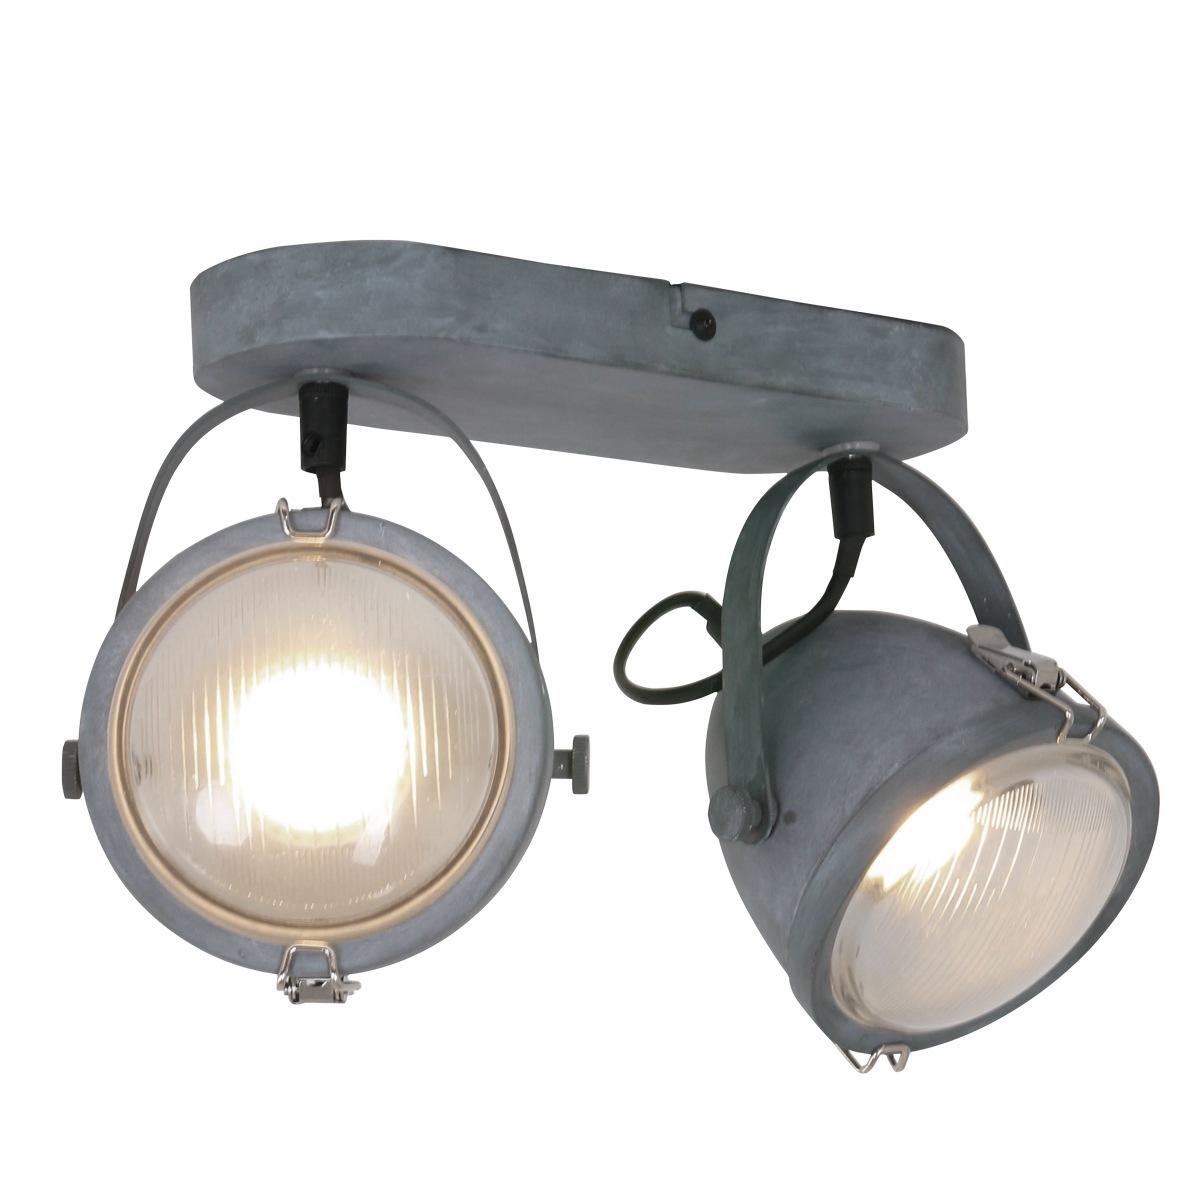 Industriële plafondlamp 2-lichts spot